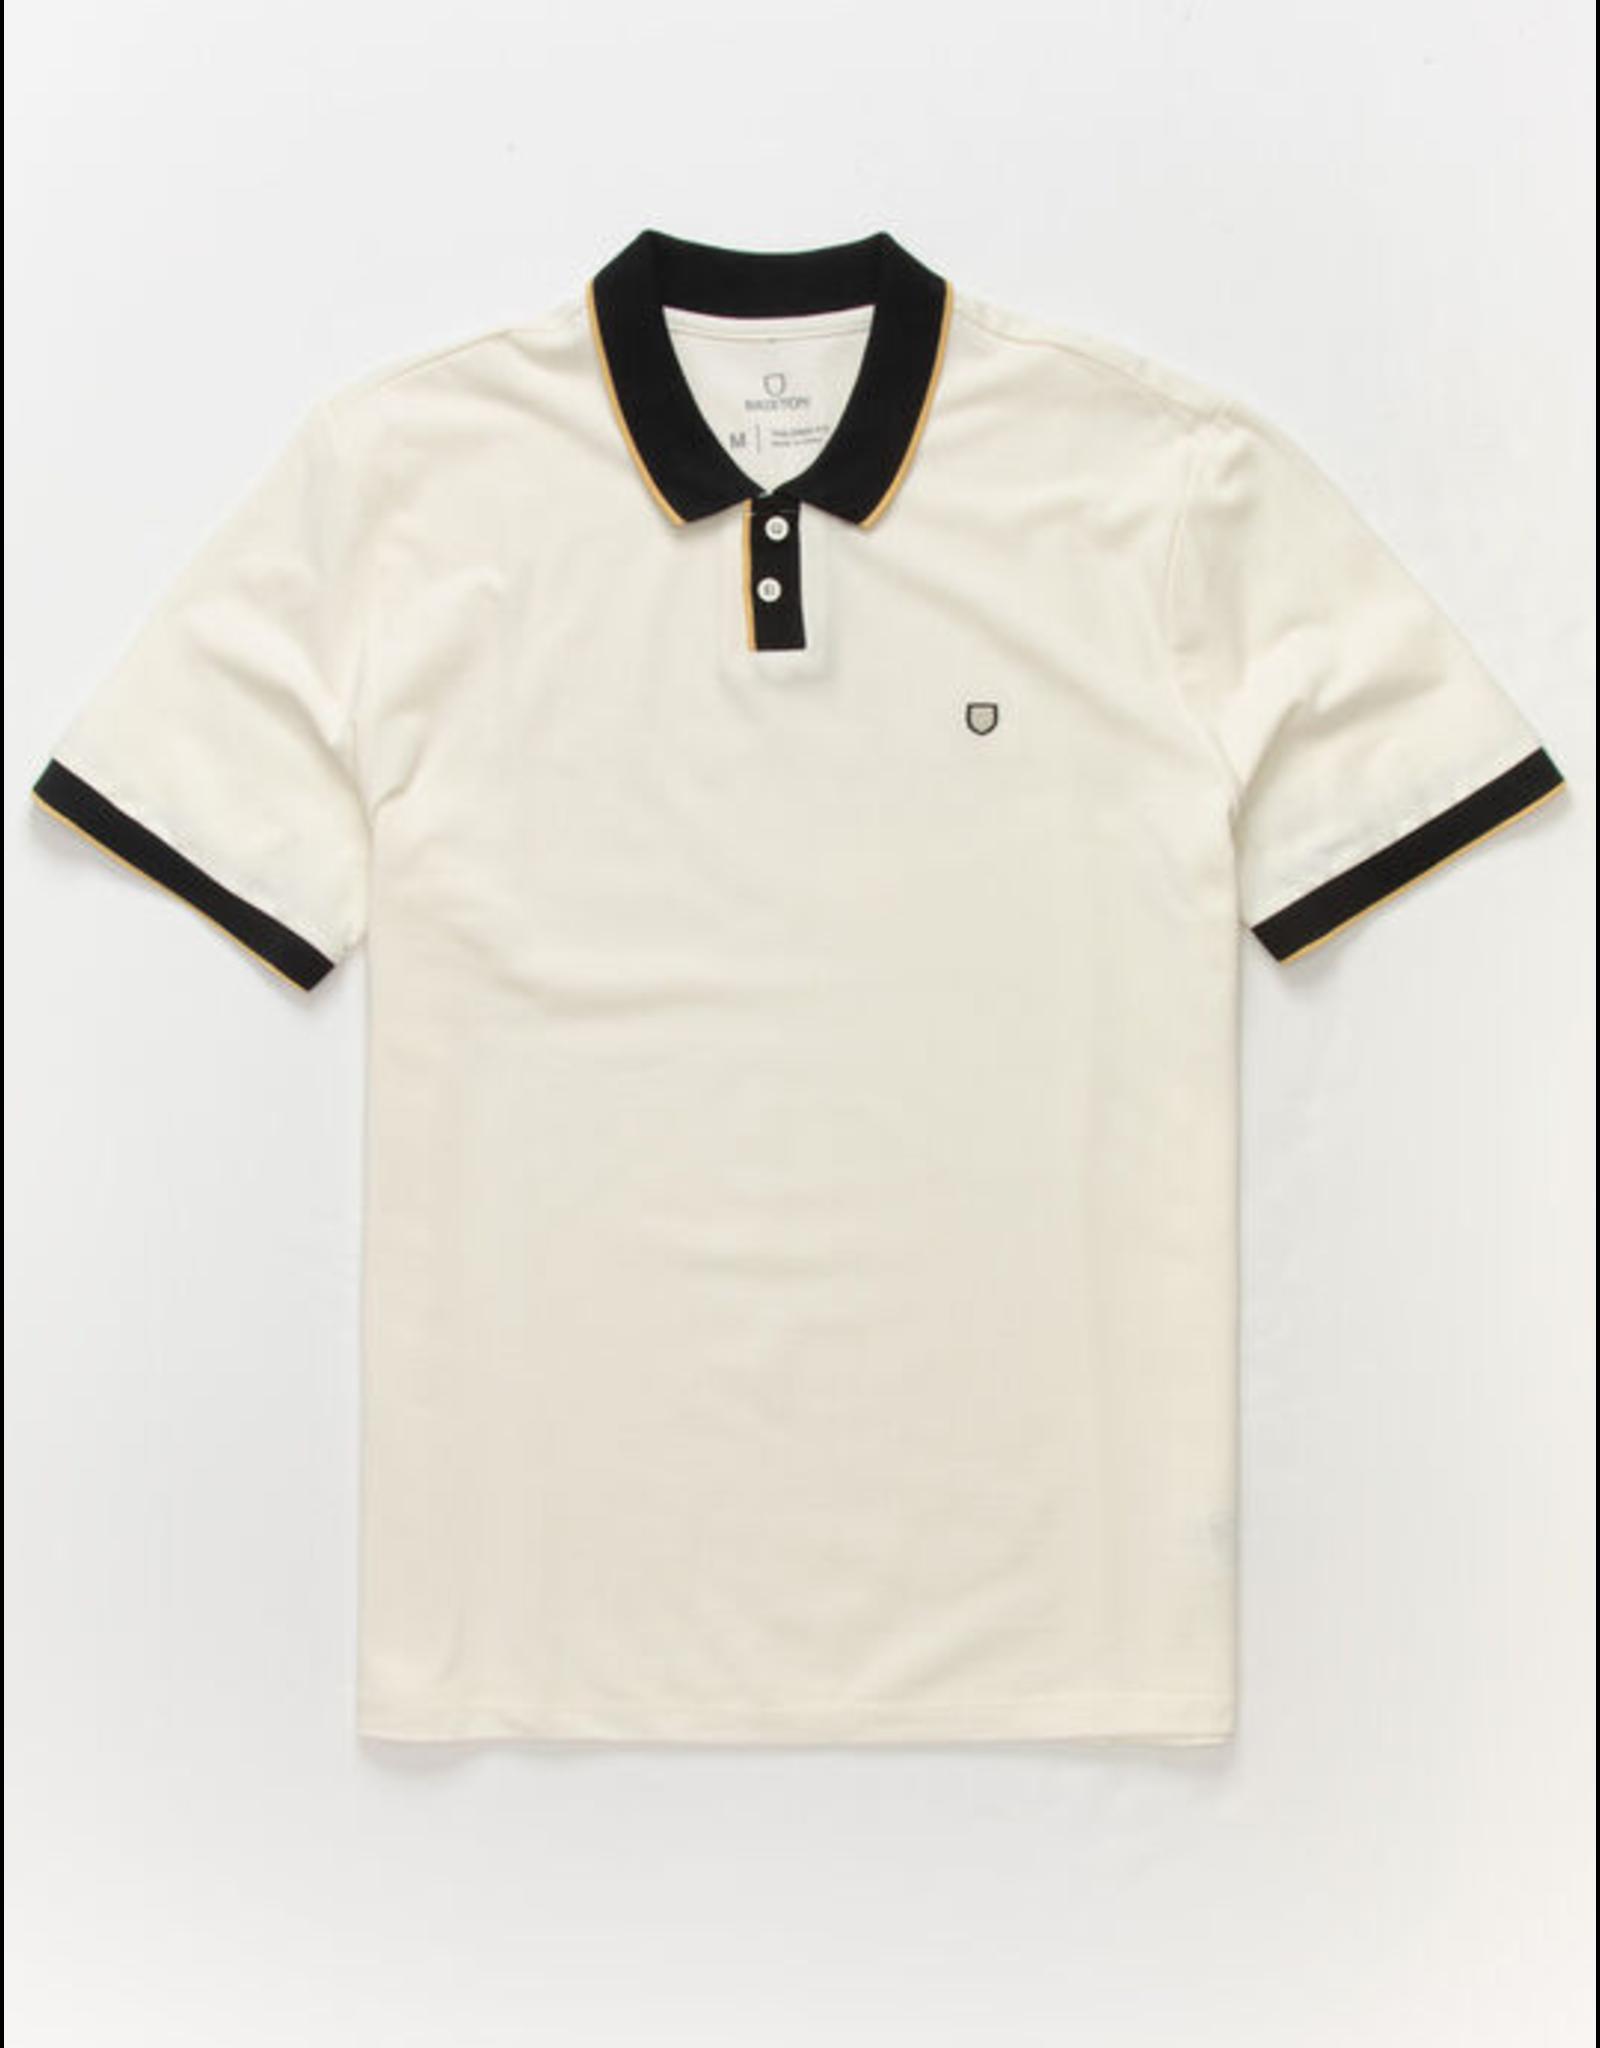 Brixton Proper S/S Jersey Polo Knit - Off White/Black